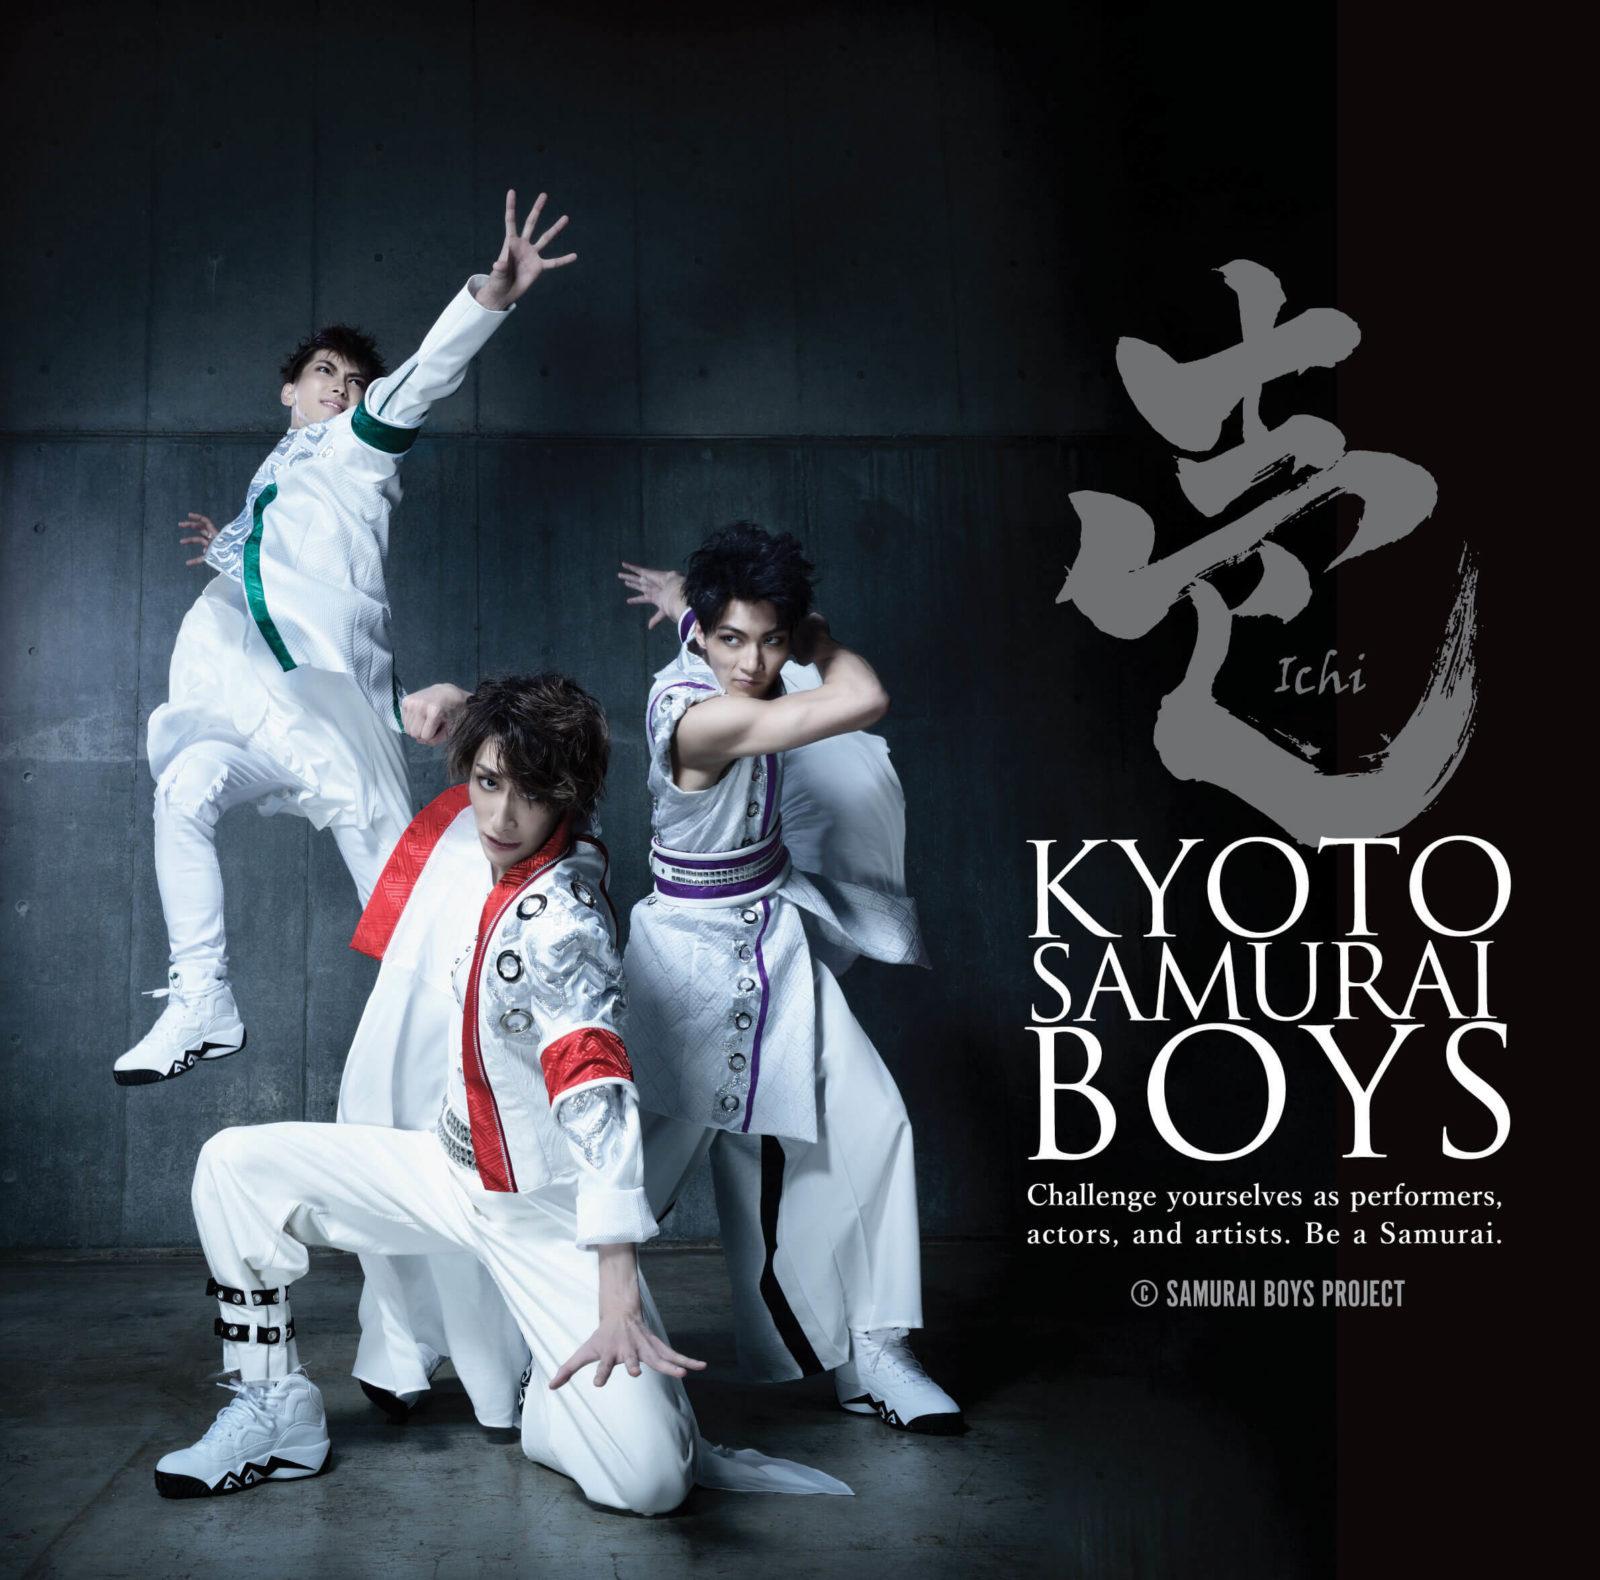 KYOTO SAMURAI BOYS、待望のCDデビュー!3月4日(水)「壱」発売サムネイル画像